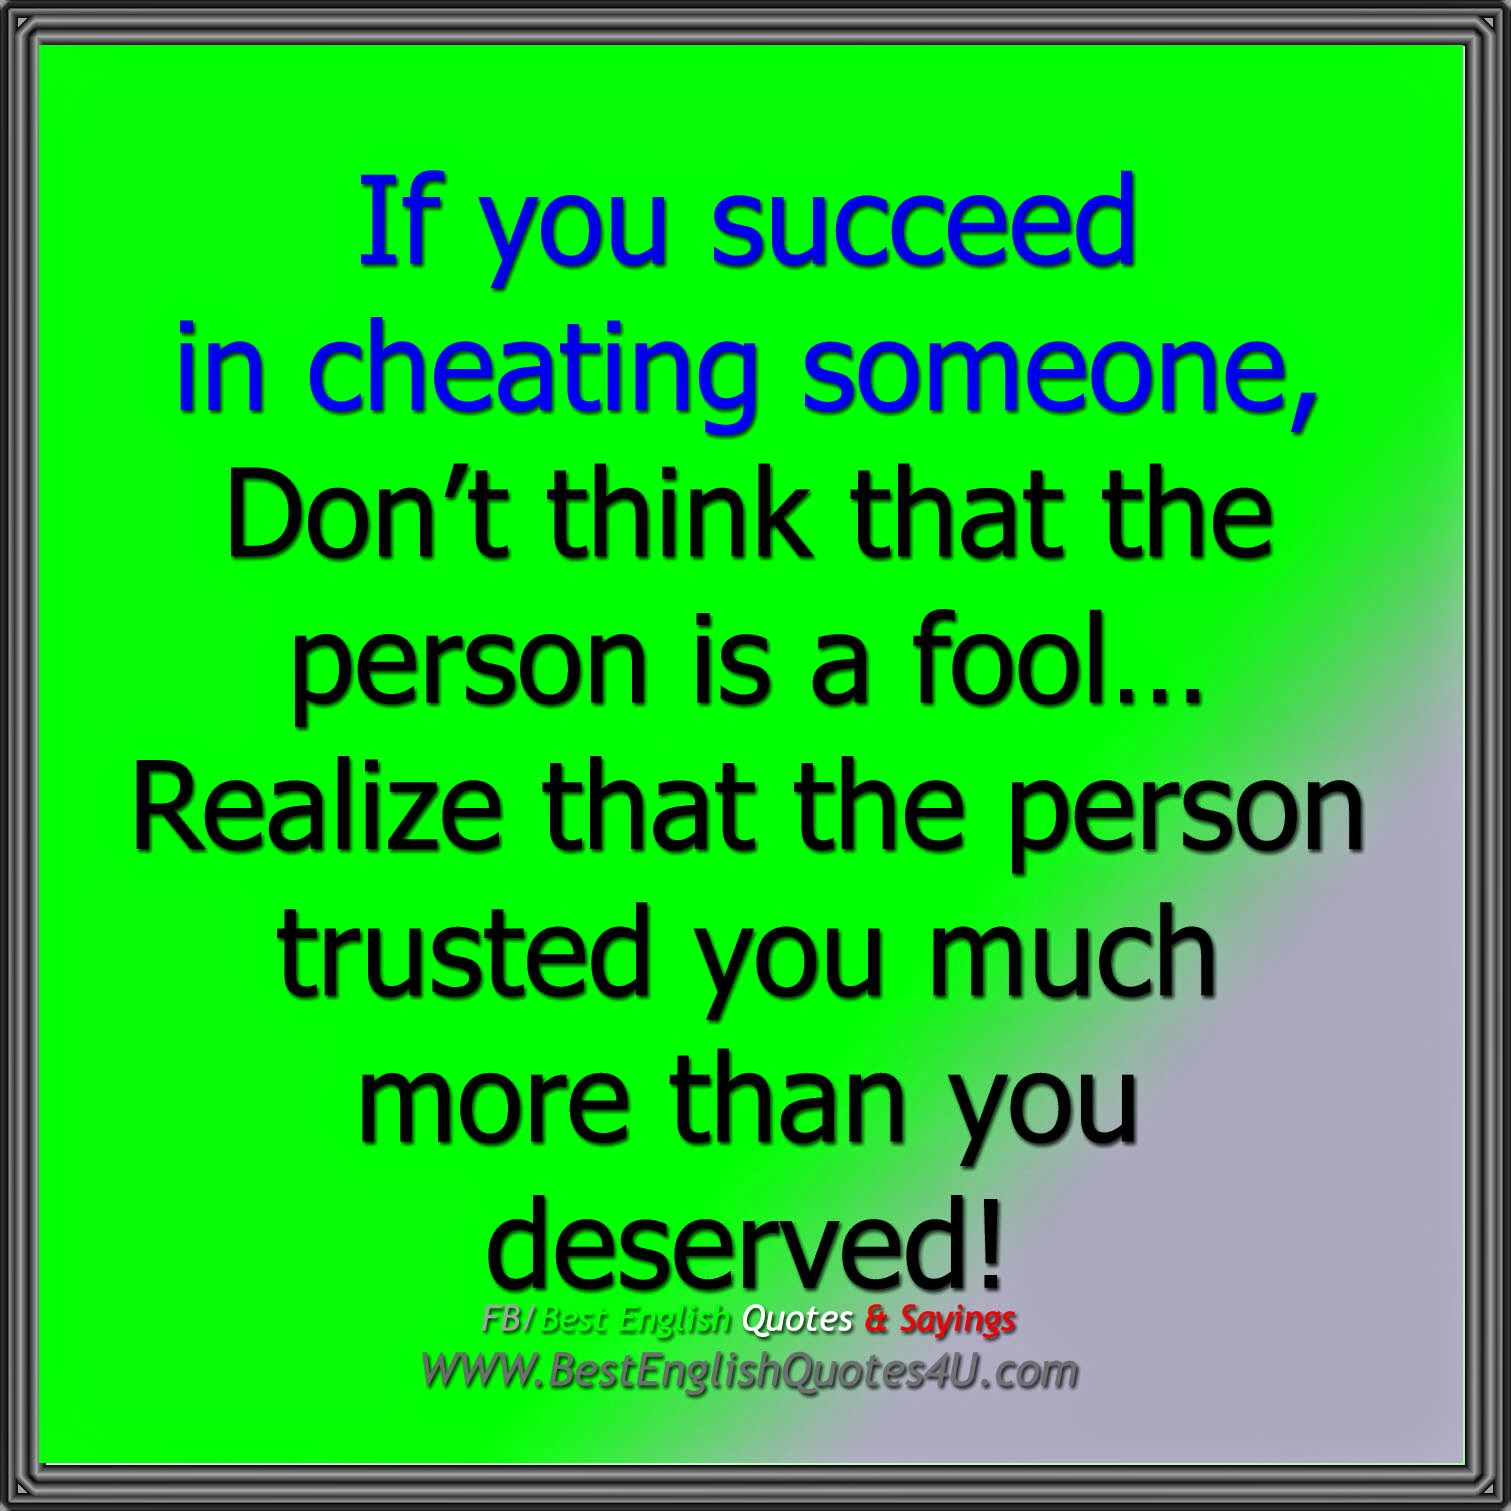 cheatwives